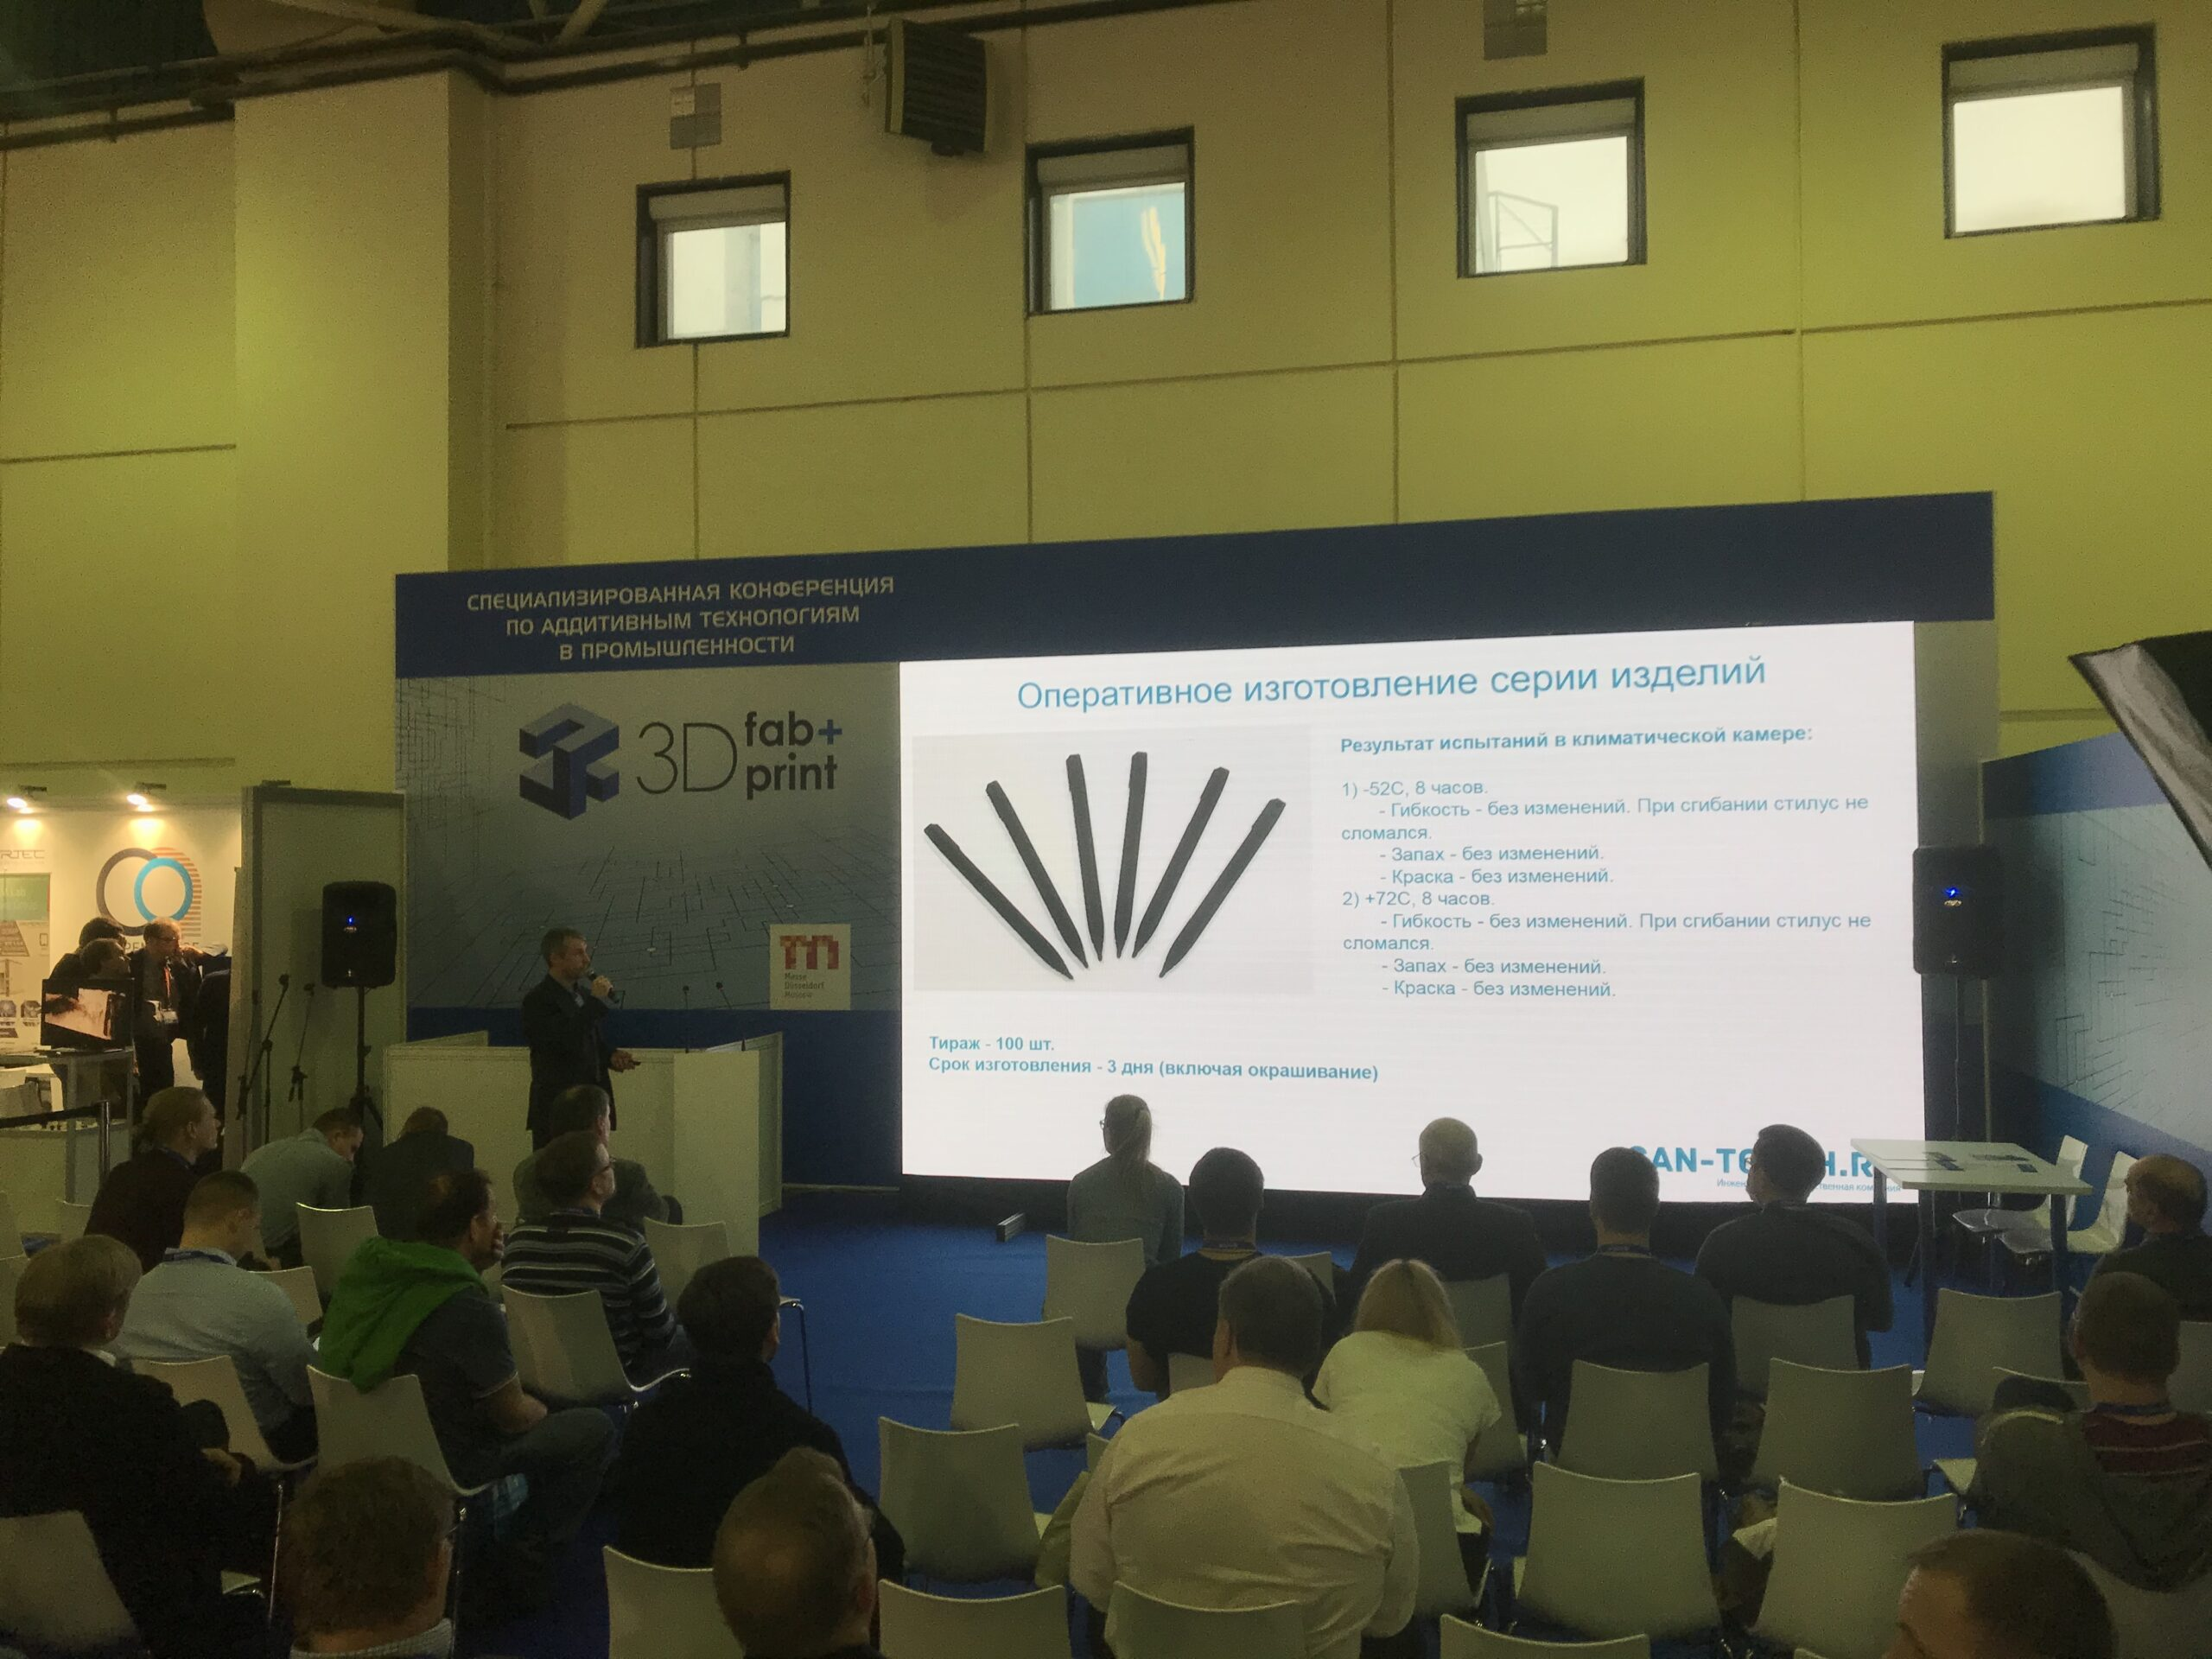 CAN-TOUCH на международной конференции «3D fab+print Russia»